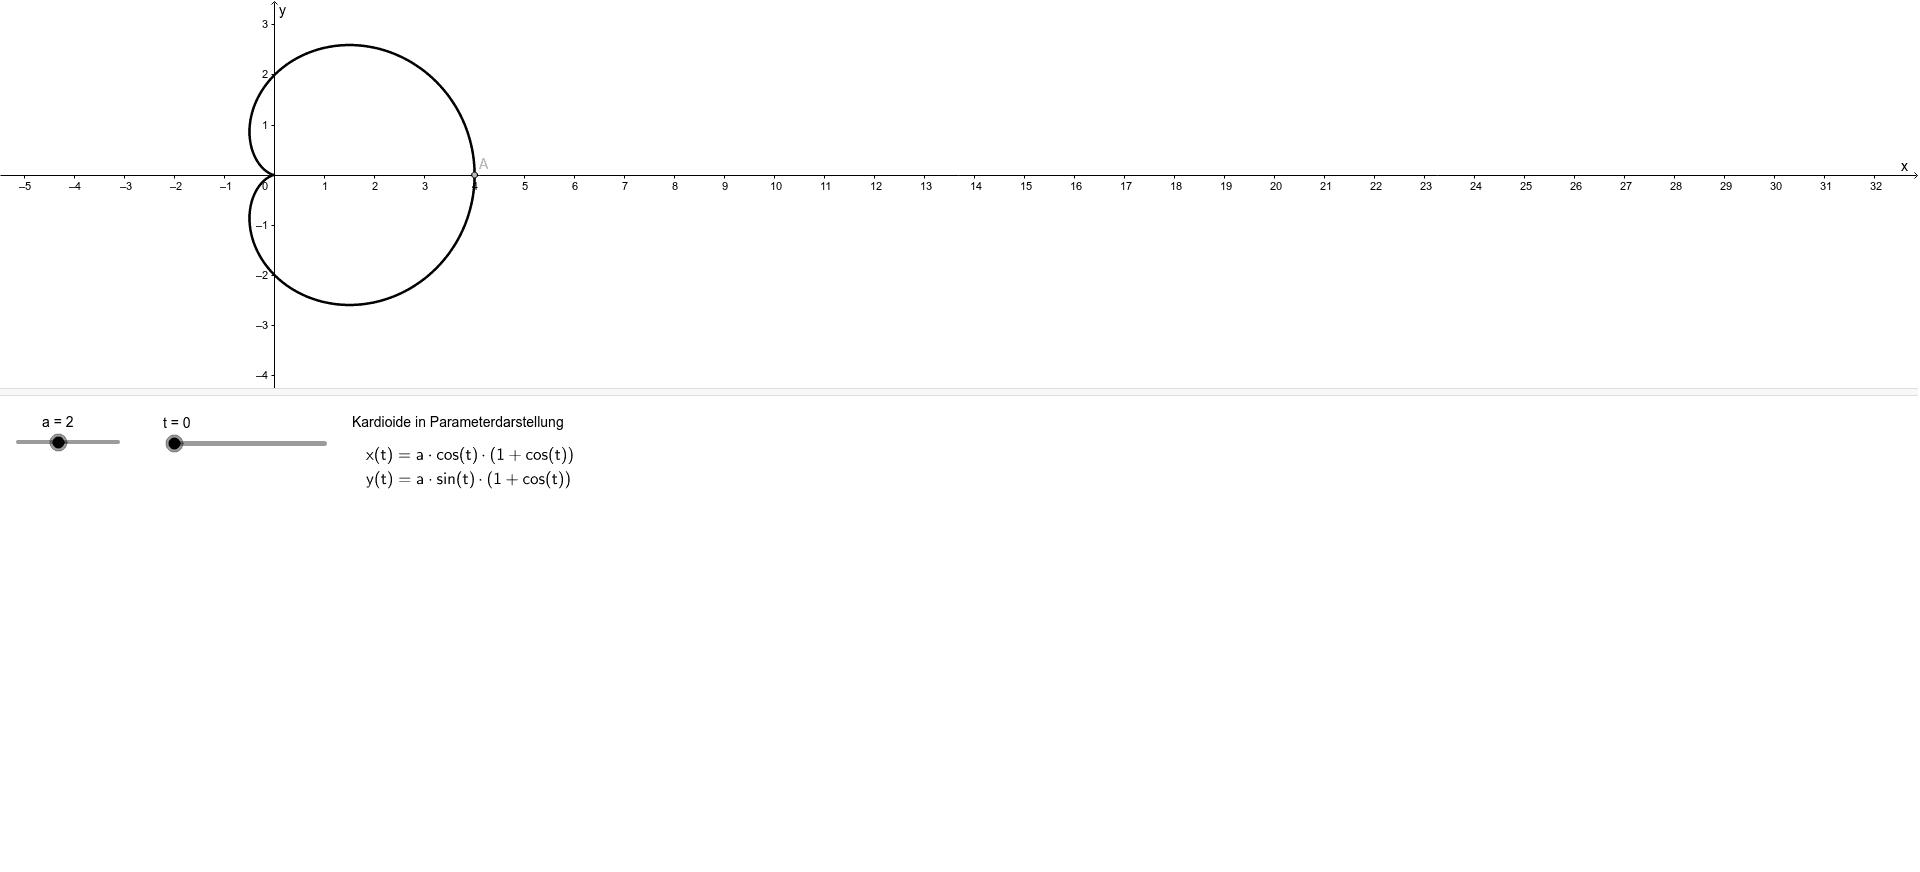 GeoGebra Applet .برای شروع کاربرگ، کلید اینتر را فشار دهید